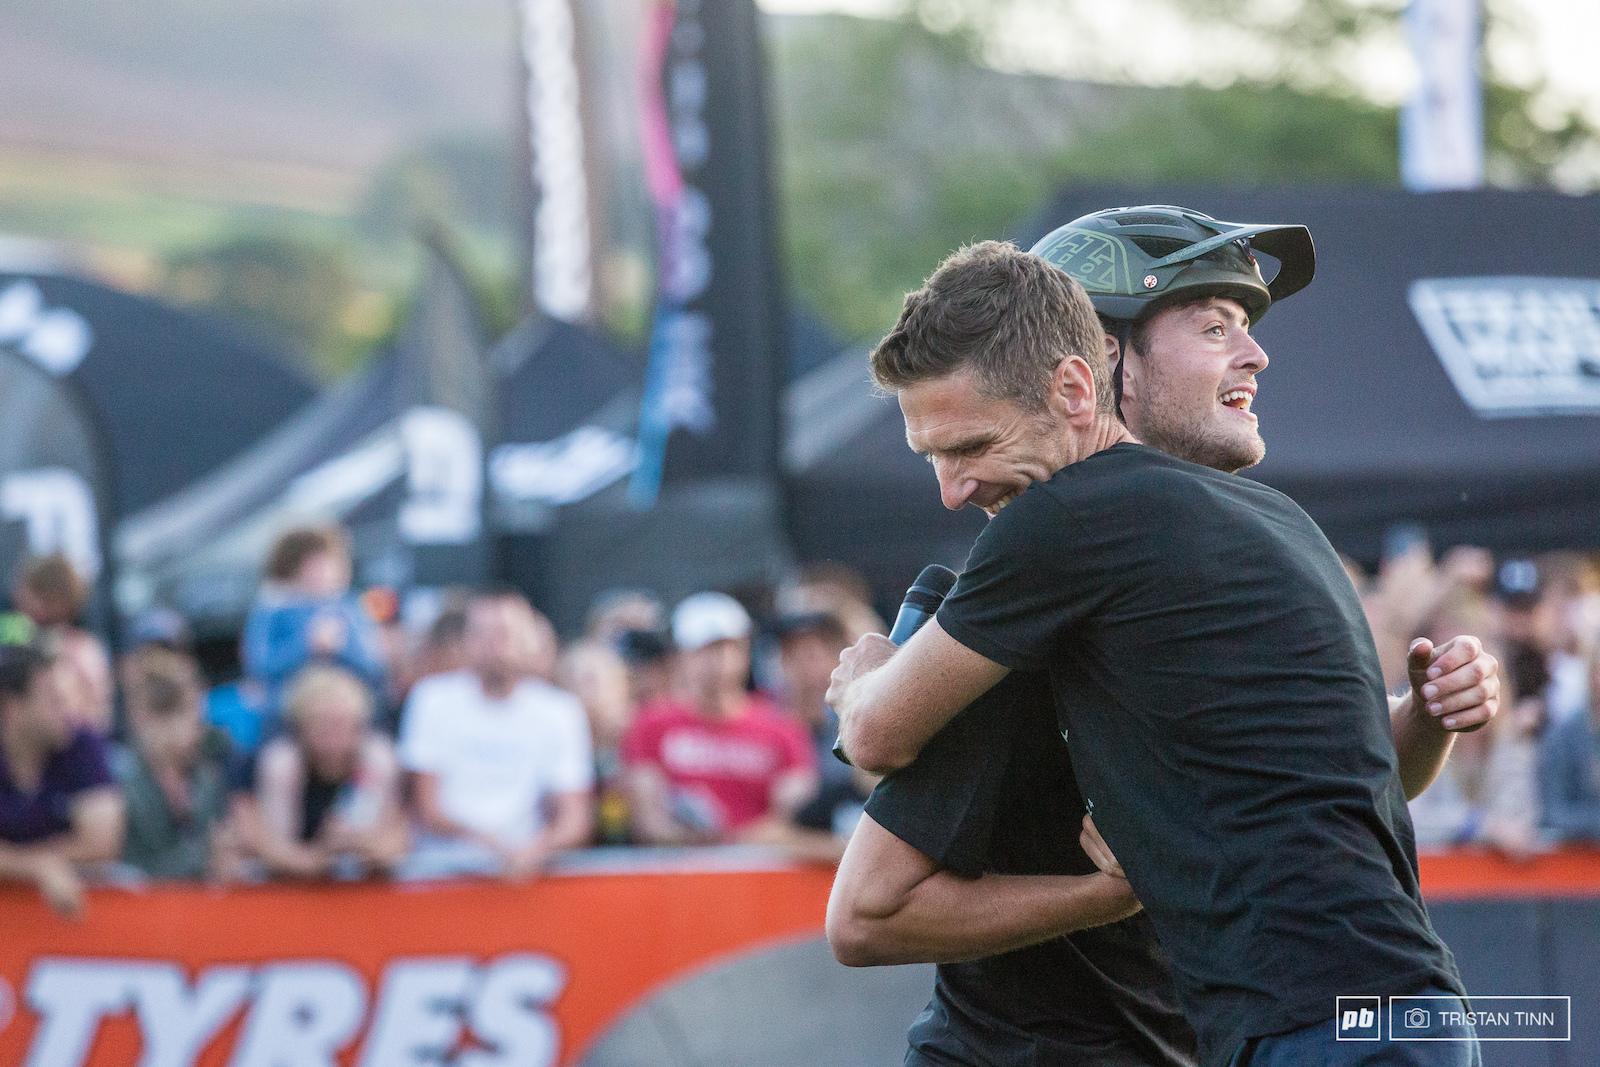 Jono Jones is congratulated on his 2nd year running as Ard Rock Pump Track Champion